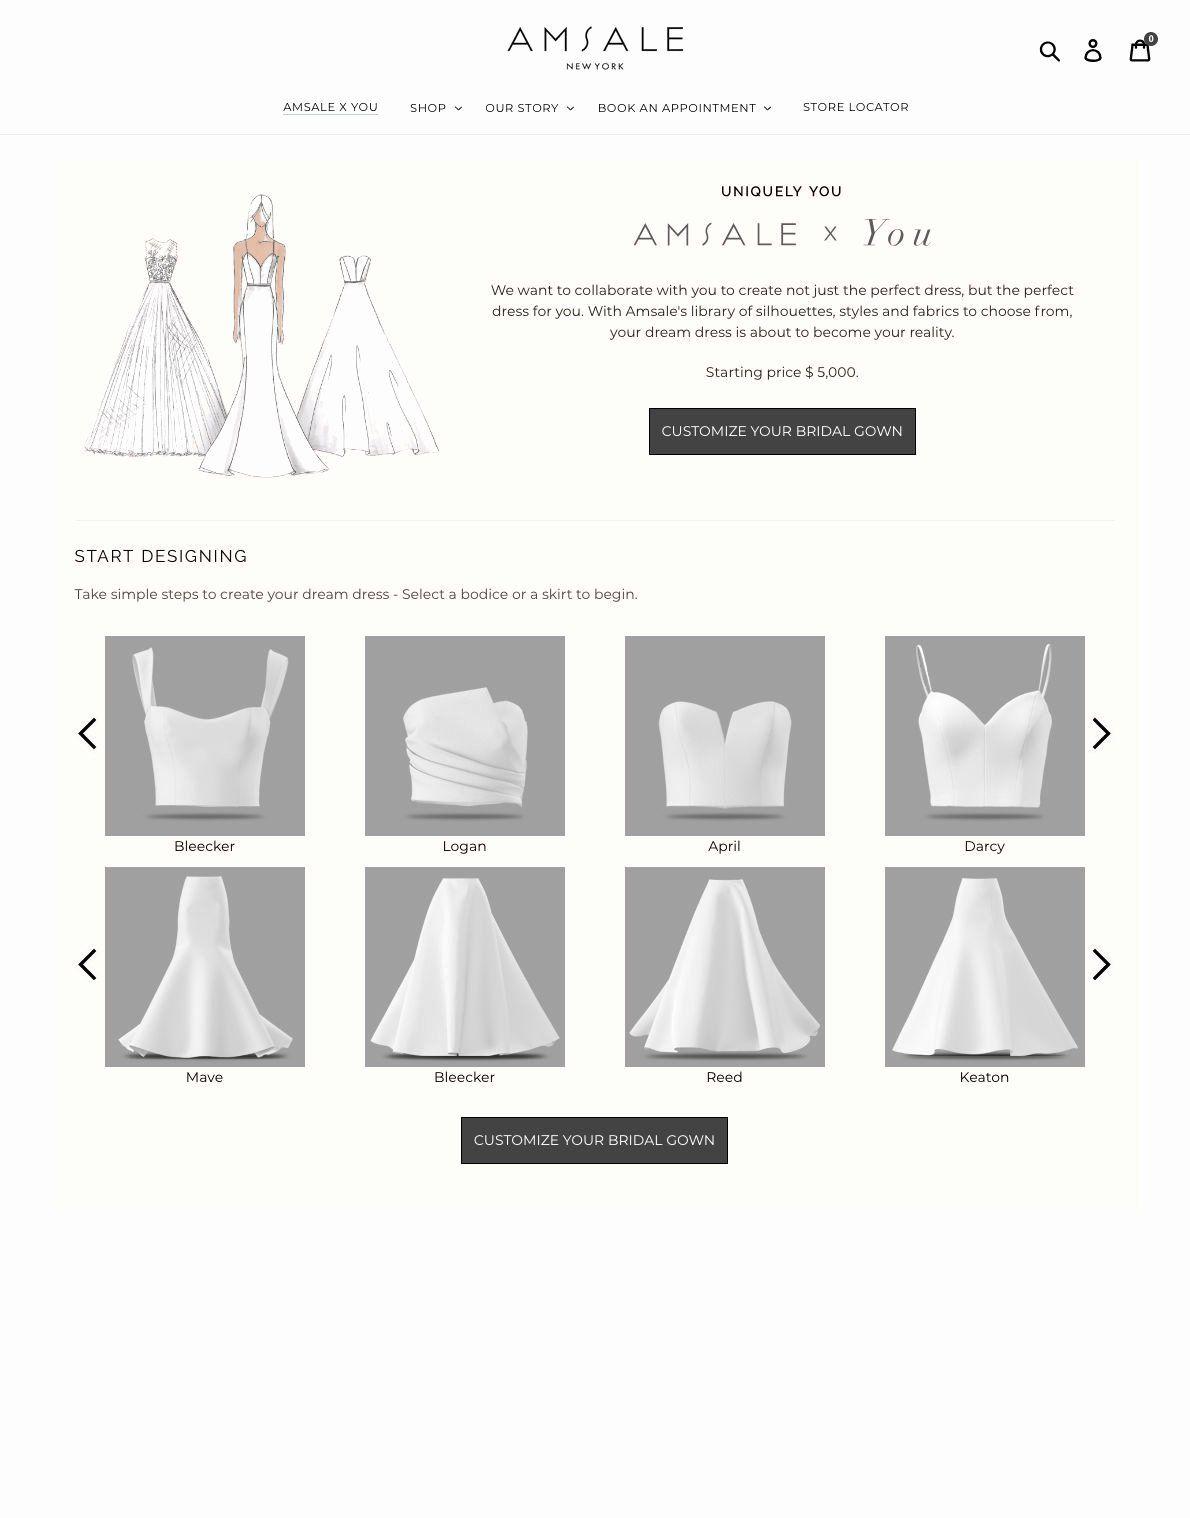 Wedding Dress Design Games Online Inspirational Barbie Doll Wedding Dress Up Games In 2020 Disney Wedding Dresses Doll Wedding Dress Online Wedding Dress